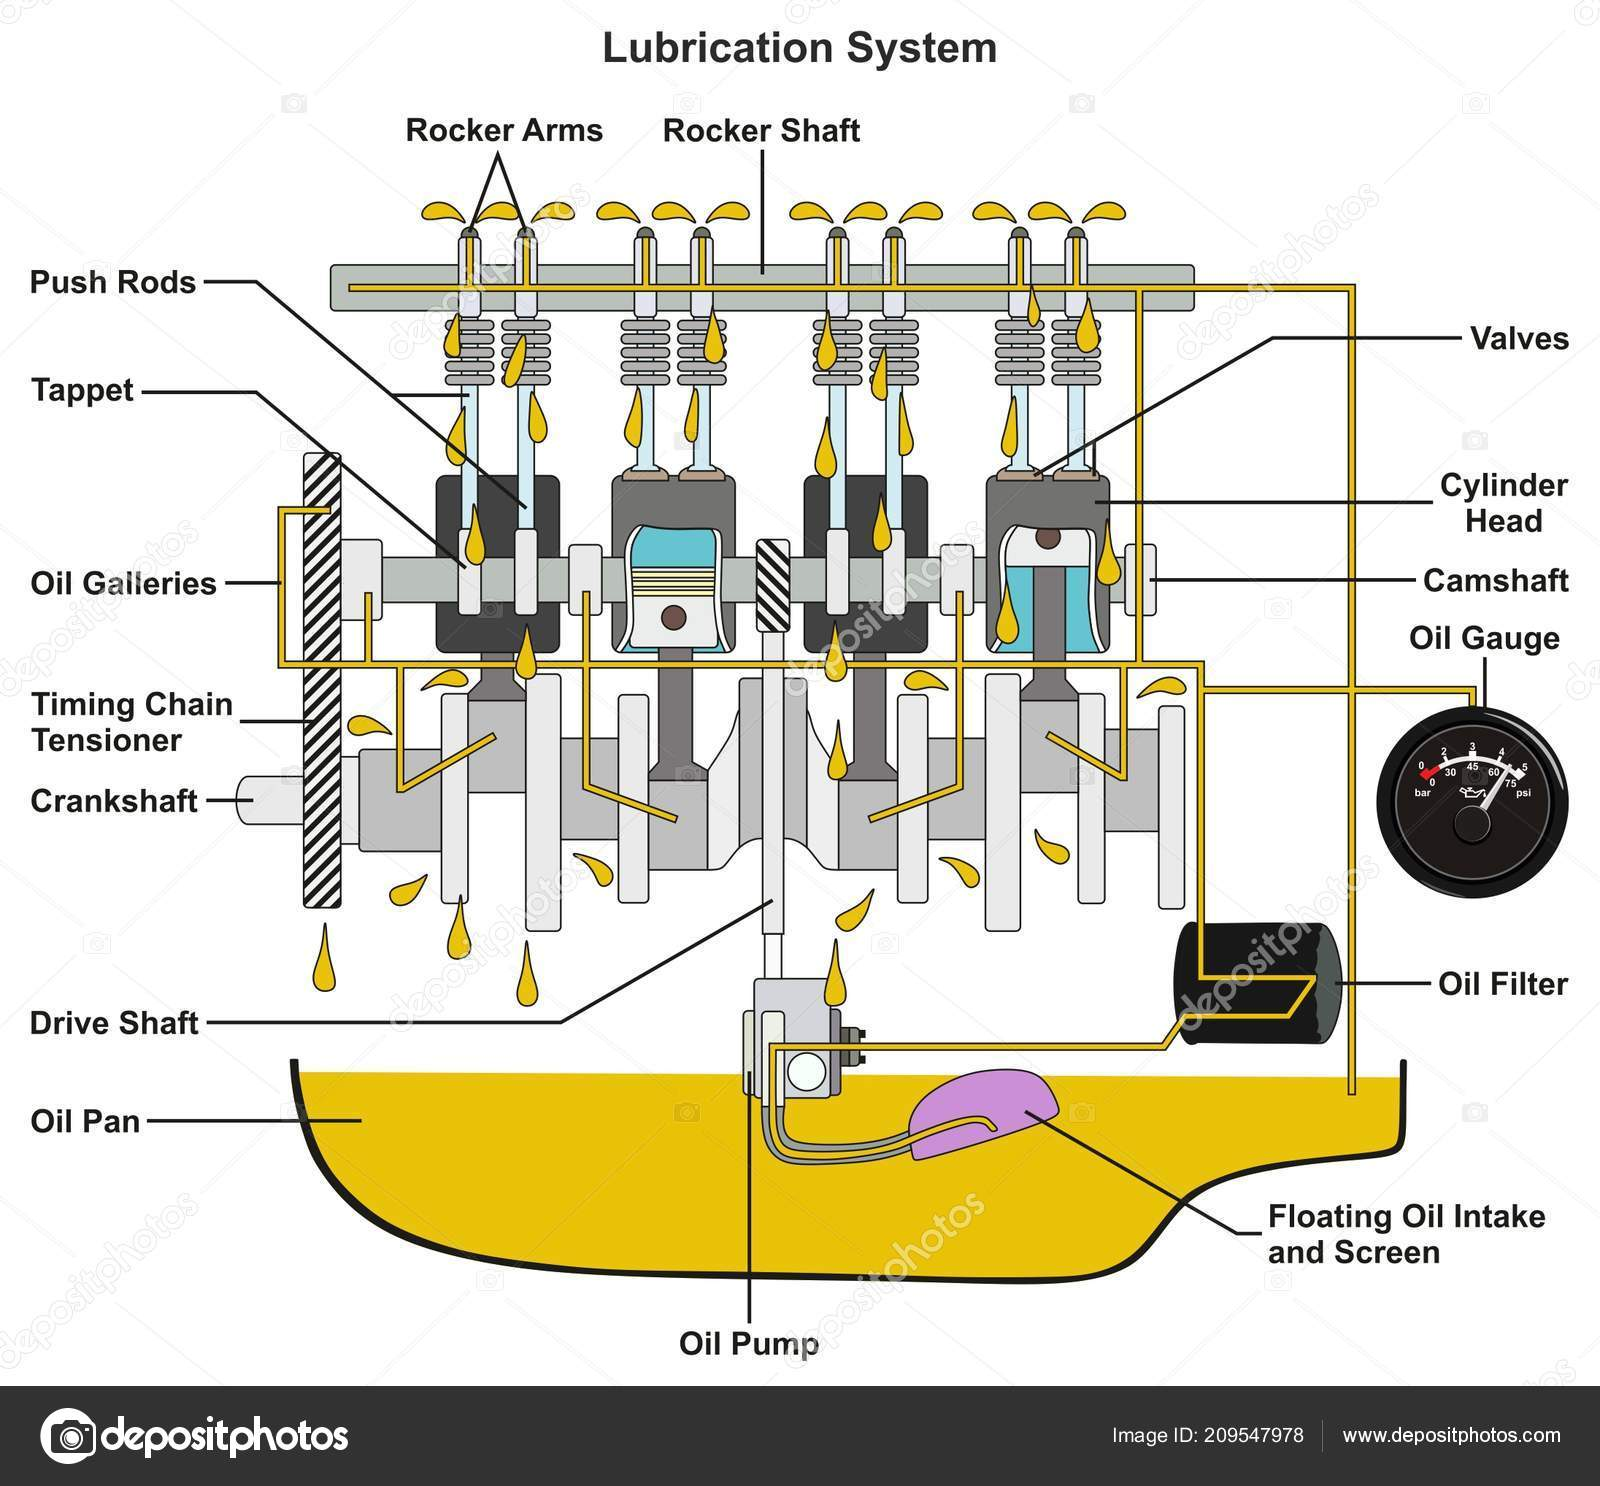 vehicle lubrication system infographic diagram showing. Black Bedroom Furniture Sets. Home Design Ideas